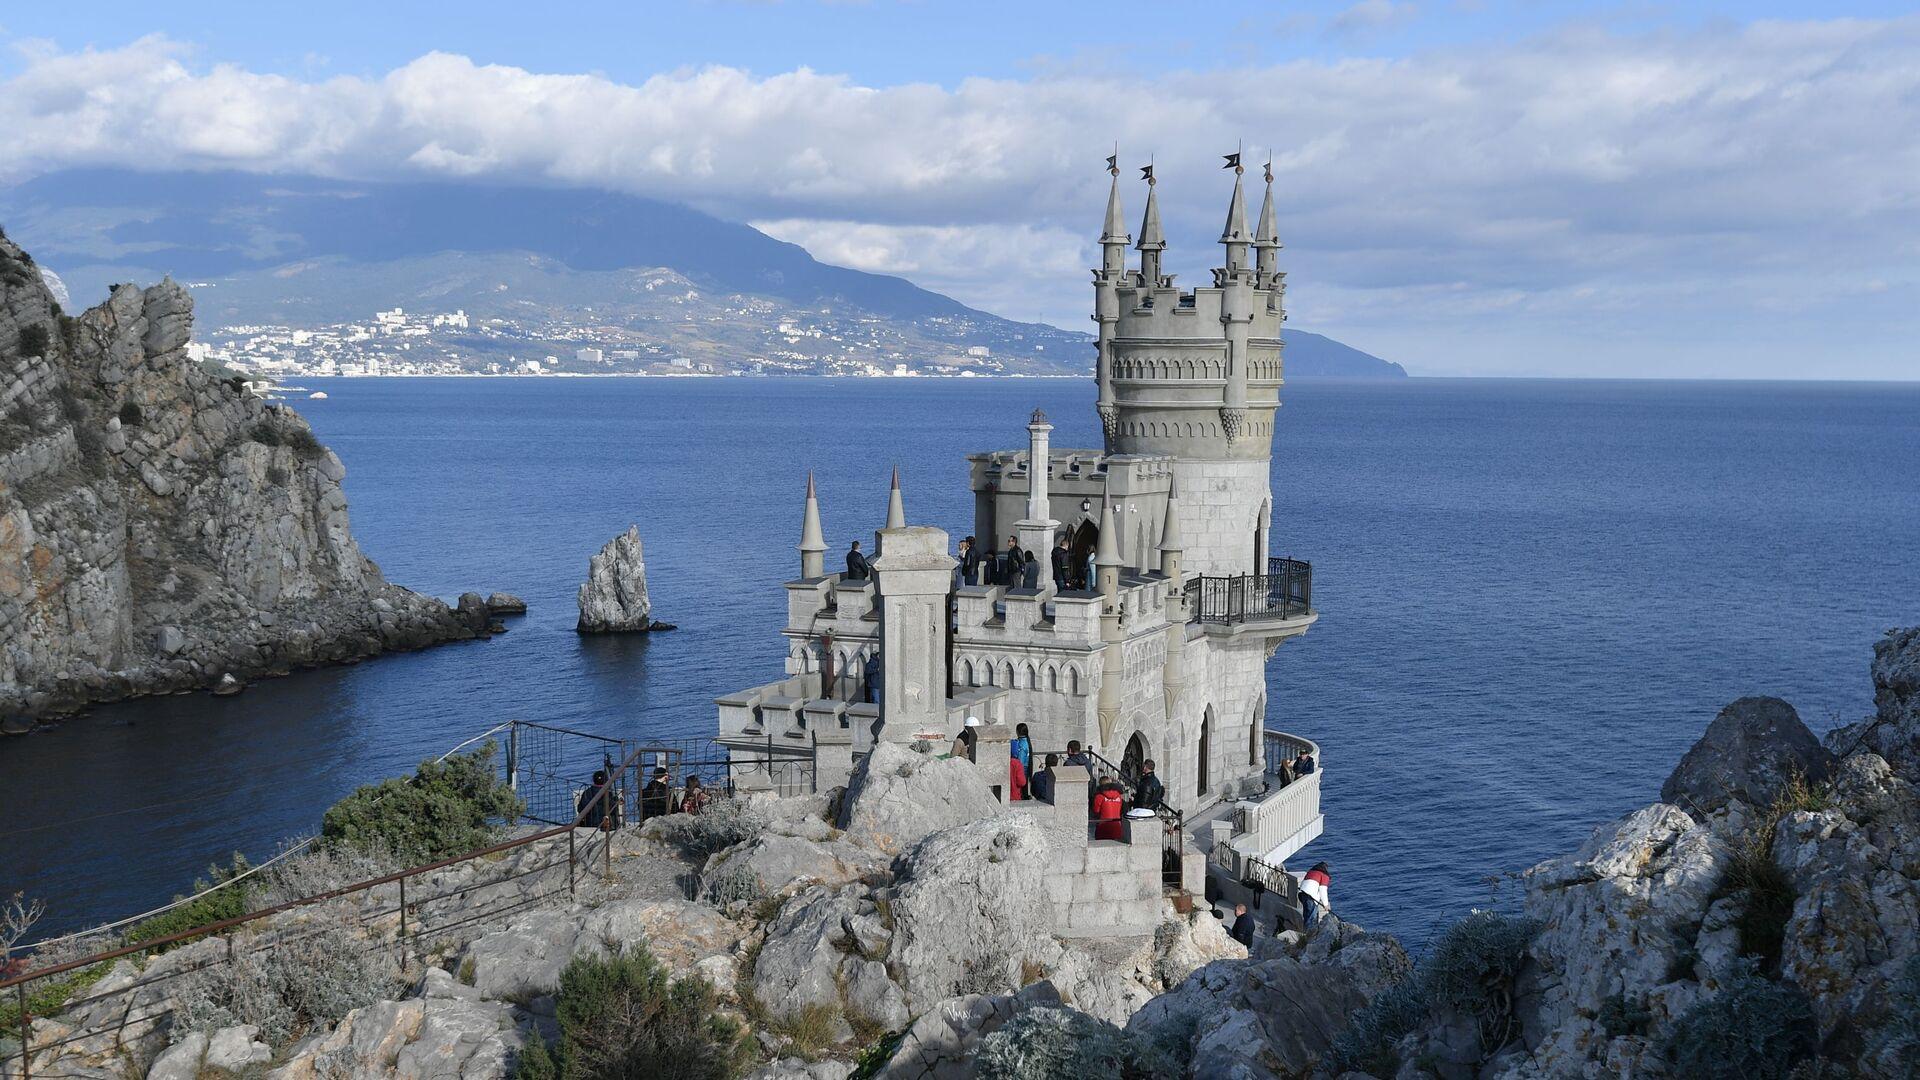 El símbolo de Crimea se reabre al público - Sputnik Mundo, 1920, 15.03.2021